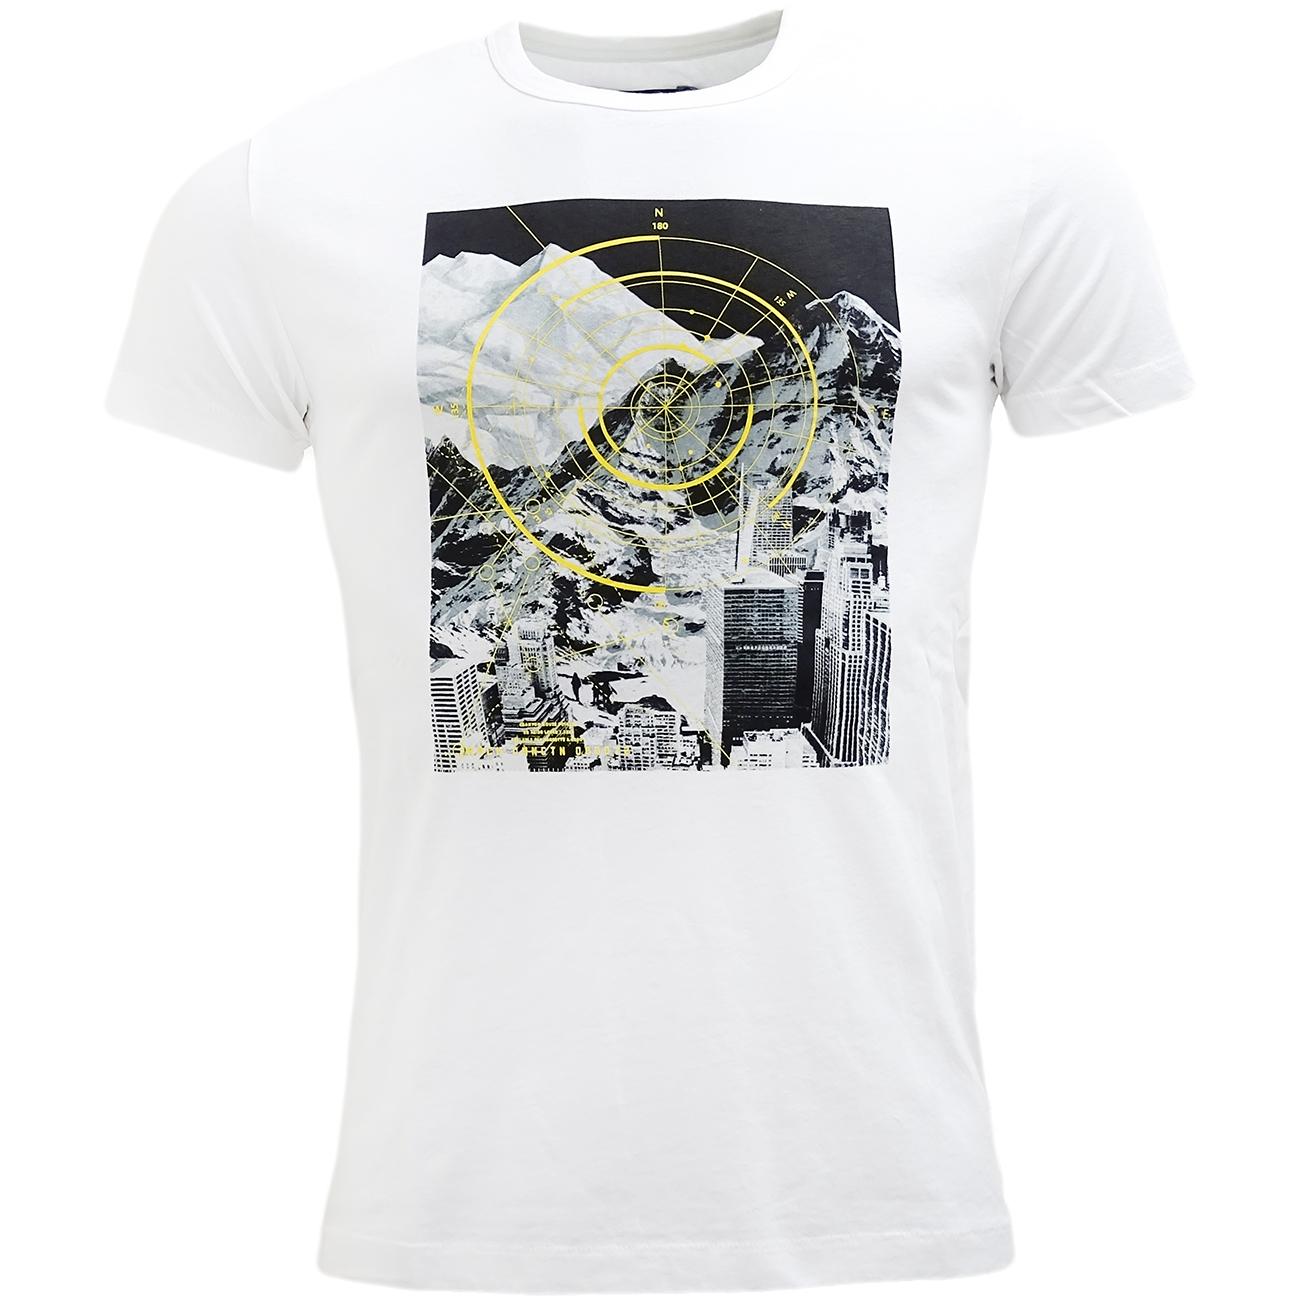 Fcuk White Slim Fit T-Shirt - 56GBM